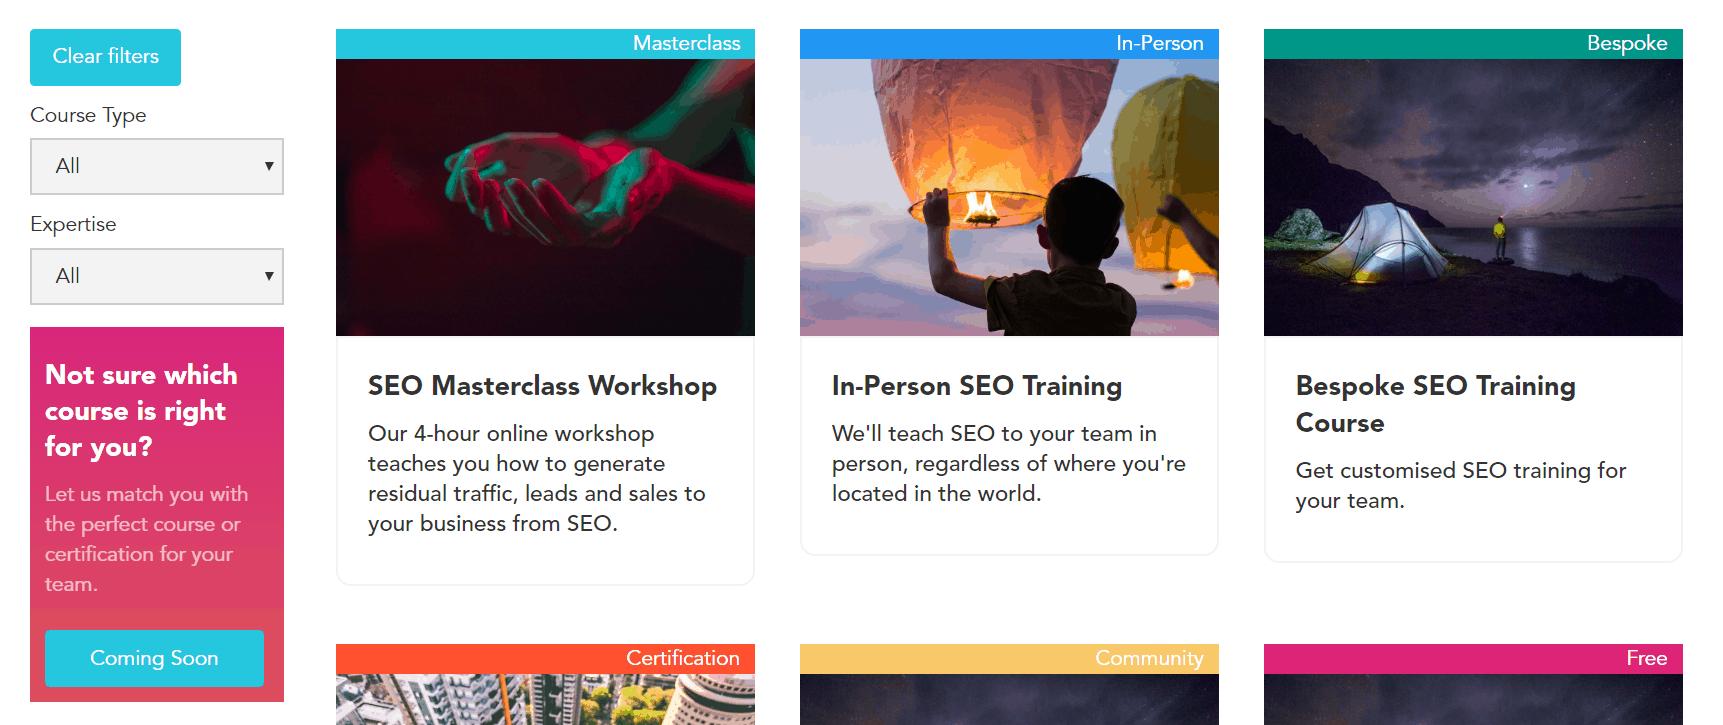 Marketing Training and Certification - Marketing Partner Program